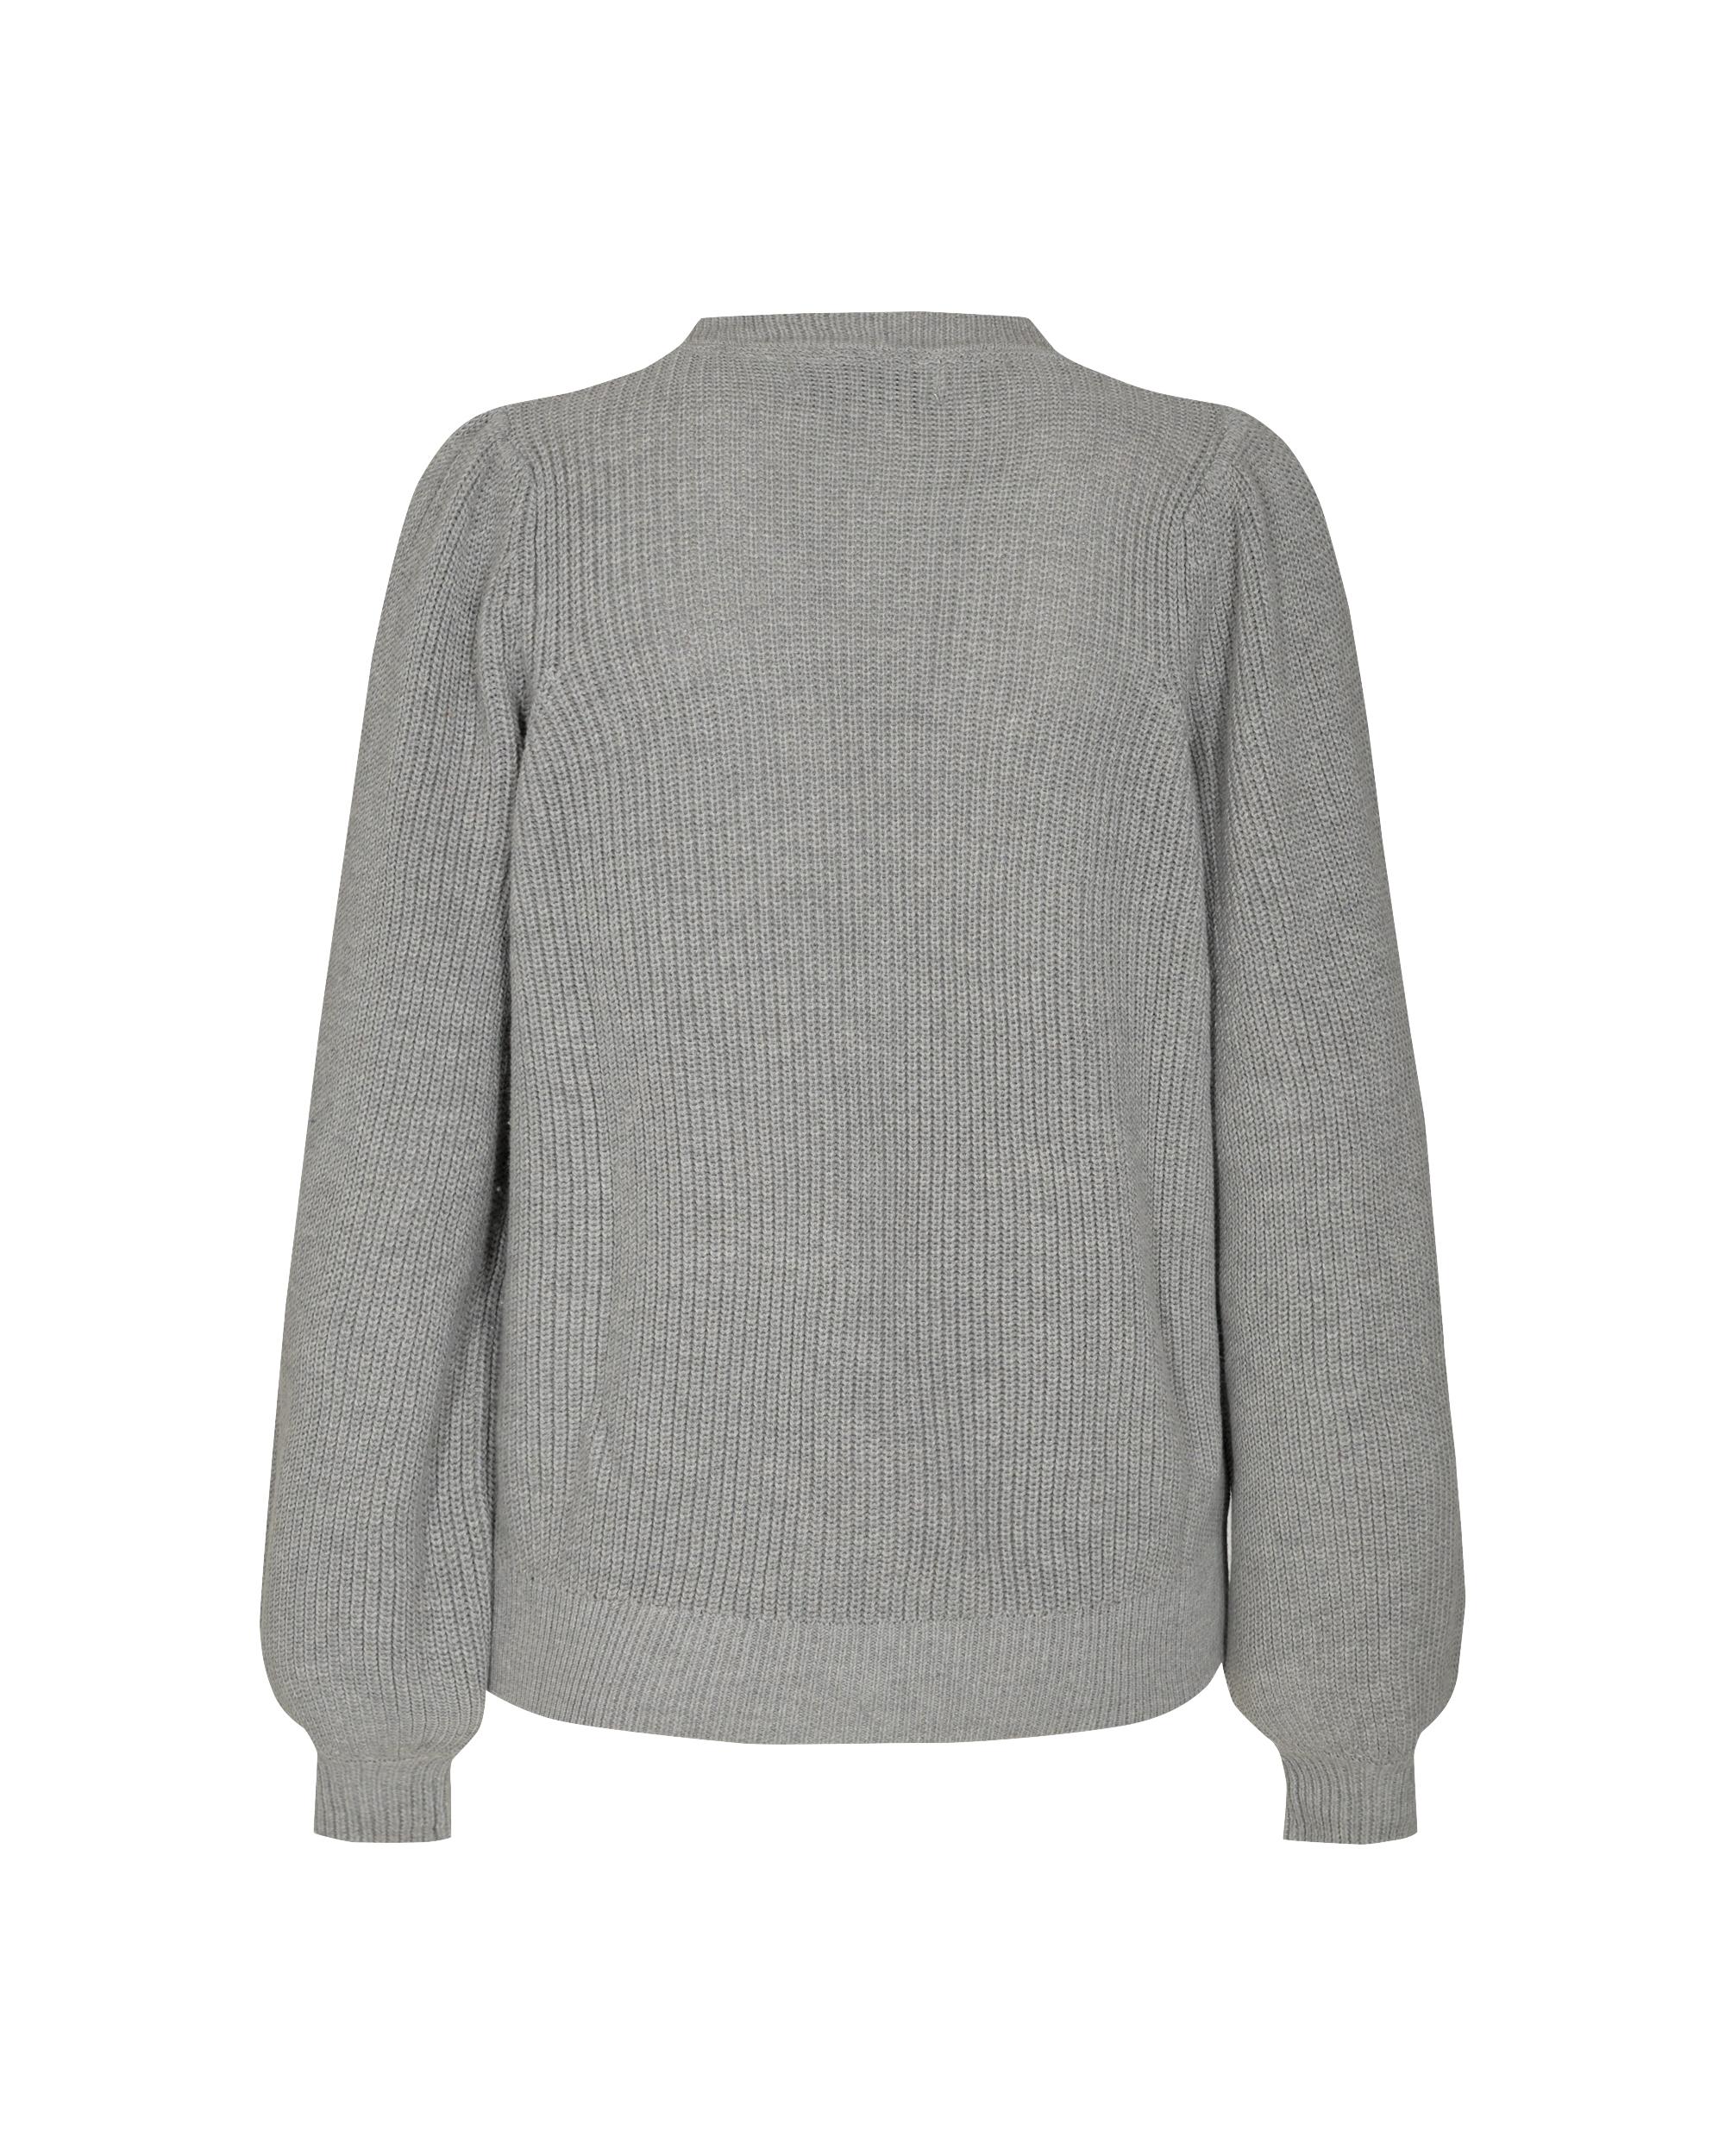 Moves Loula cardigan, light grey melange, small